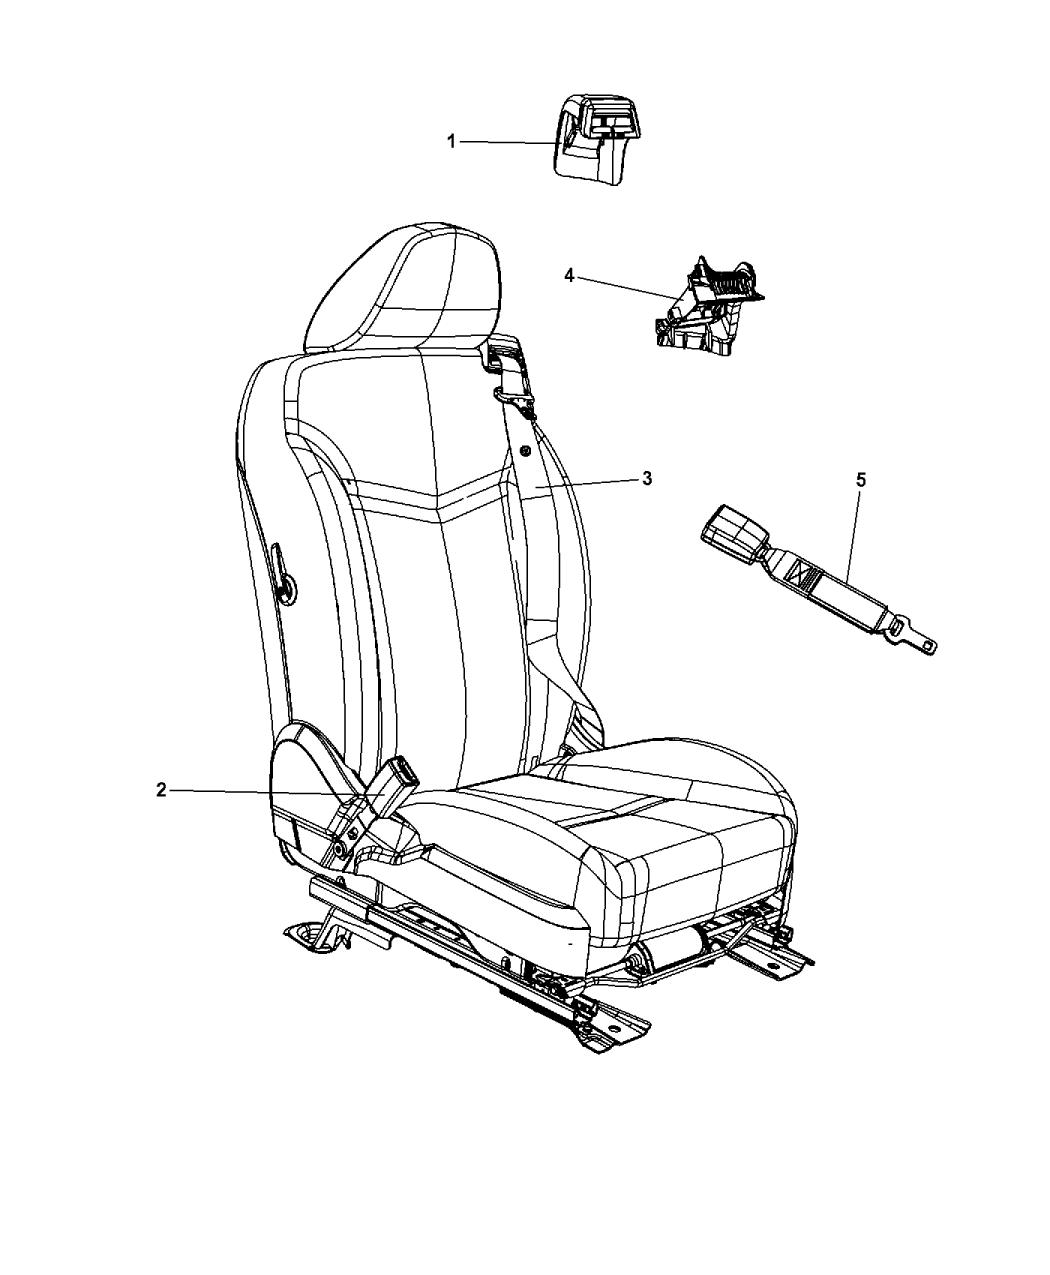 Chrysler 200: Seat Belts